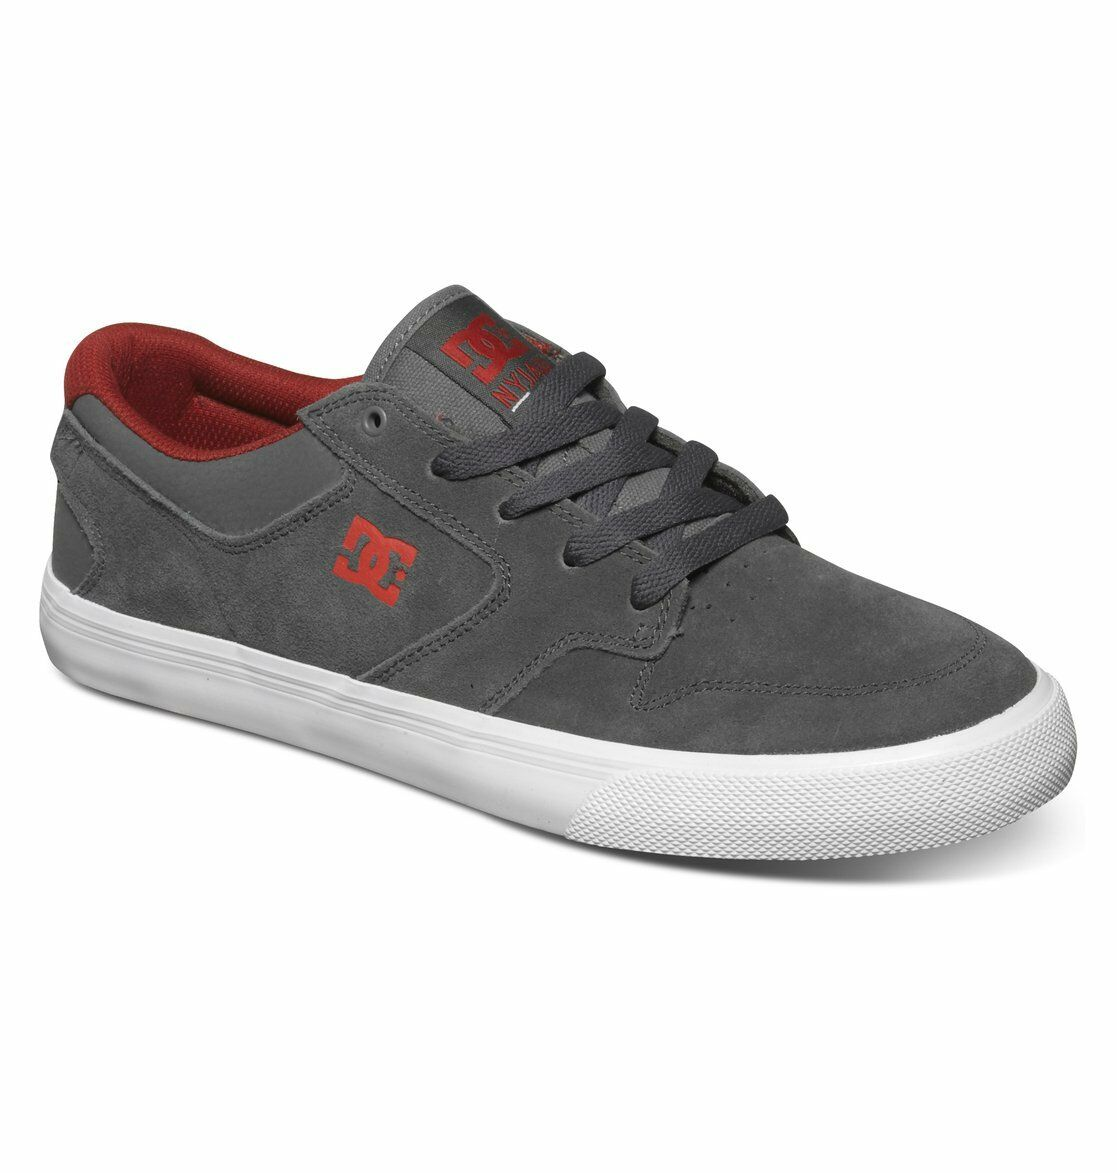 DC Uomo - NYJAH VULC  Uomo DC Skate Schuhes (NEW w/ FREE SHIP) Dark Shadow - SUEDE Footwear 1a4c16